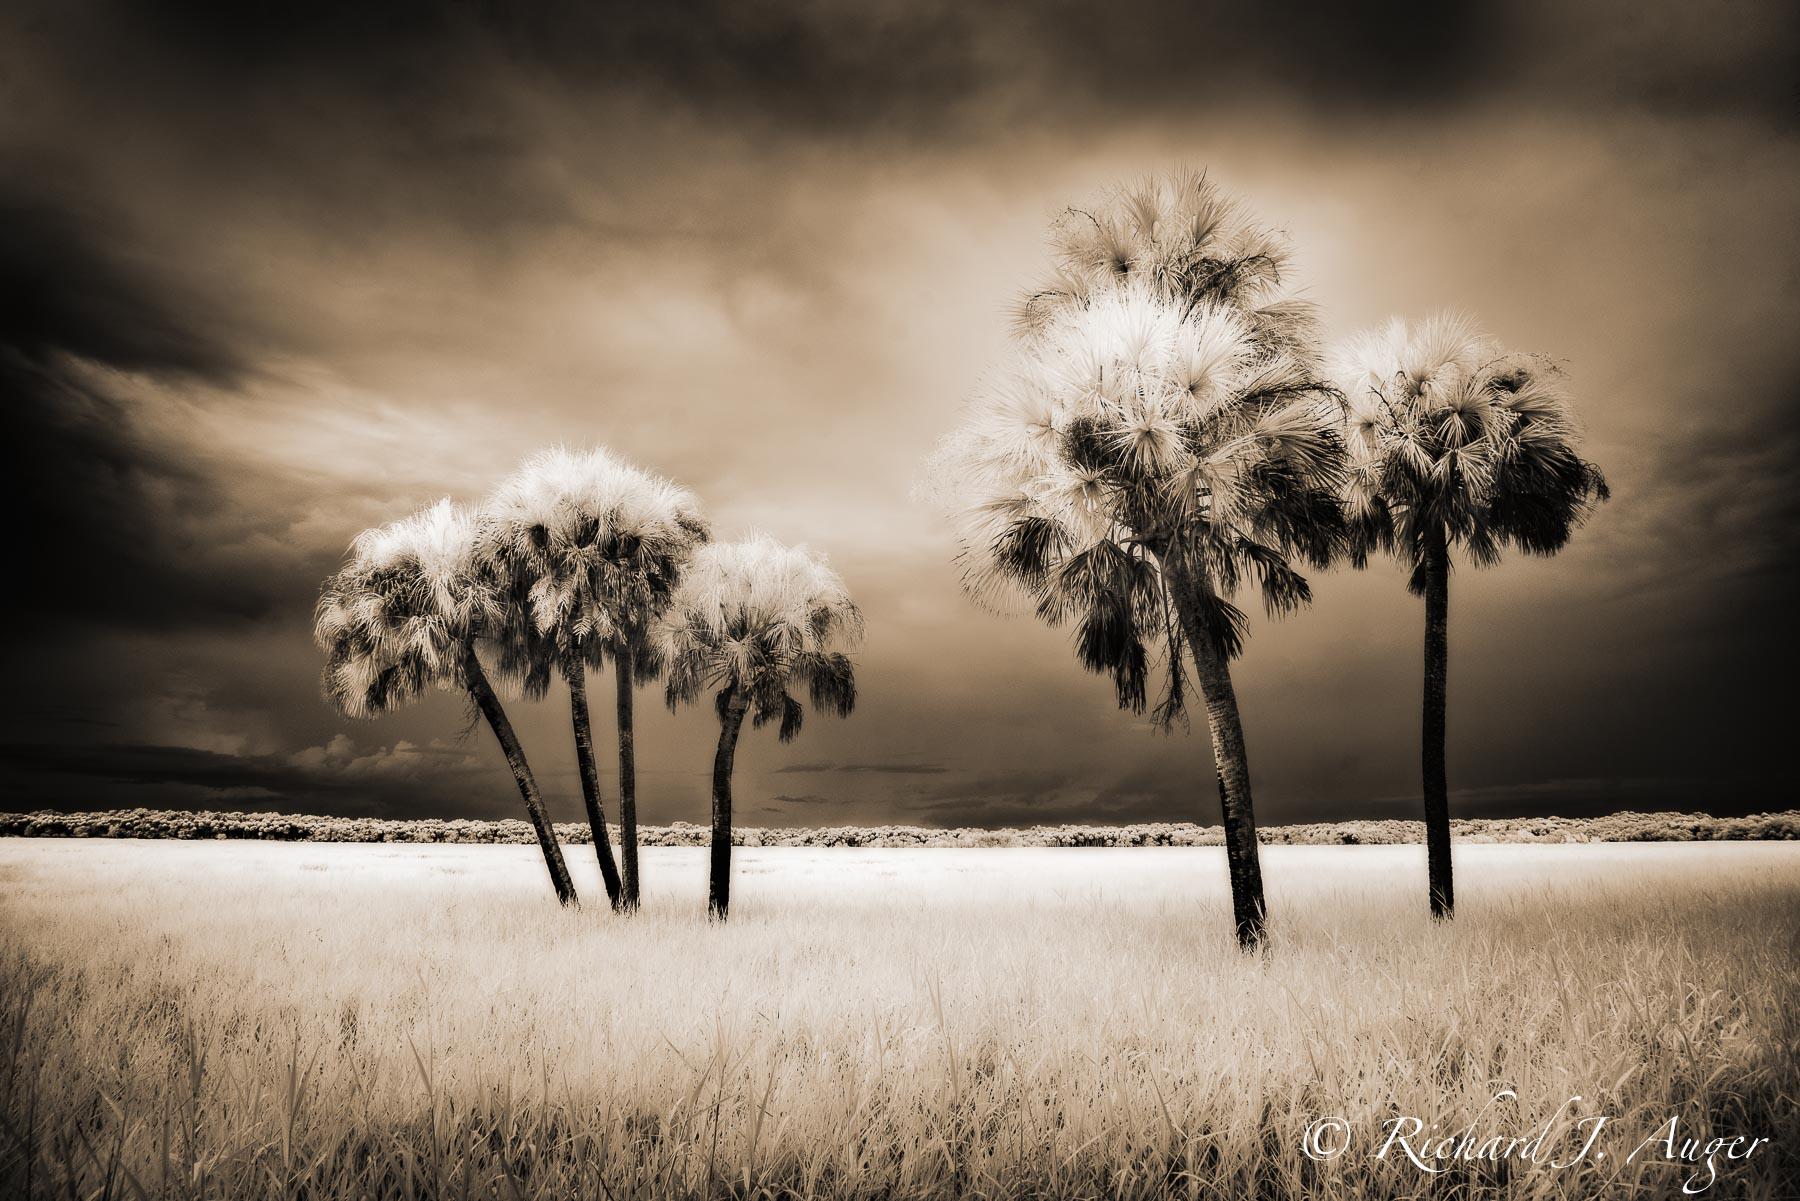 Myakka River State Park, Florida, Palm Trees, Infrared, Moody, Storm, Monochrome, Sepia, Photograph, Photographer, Landscape, Art